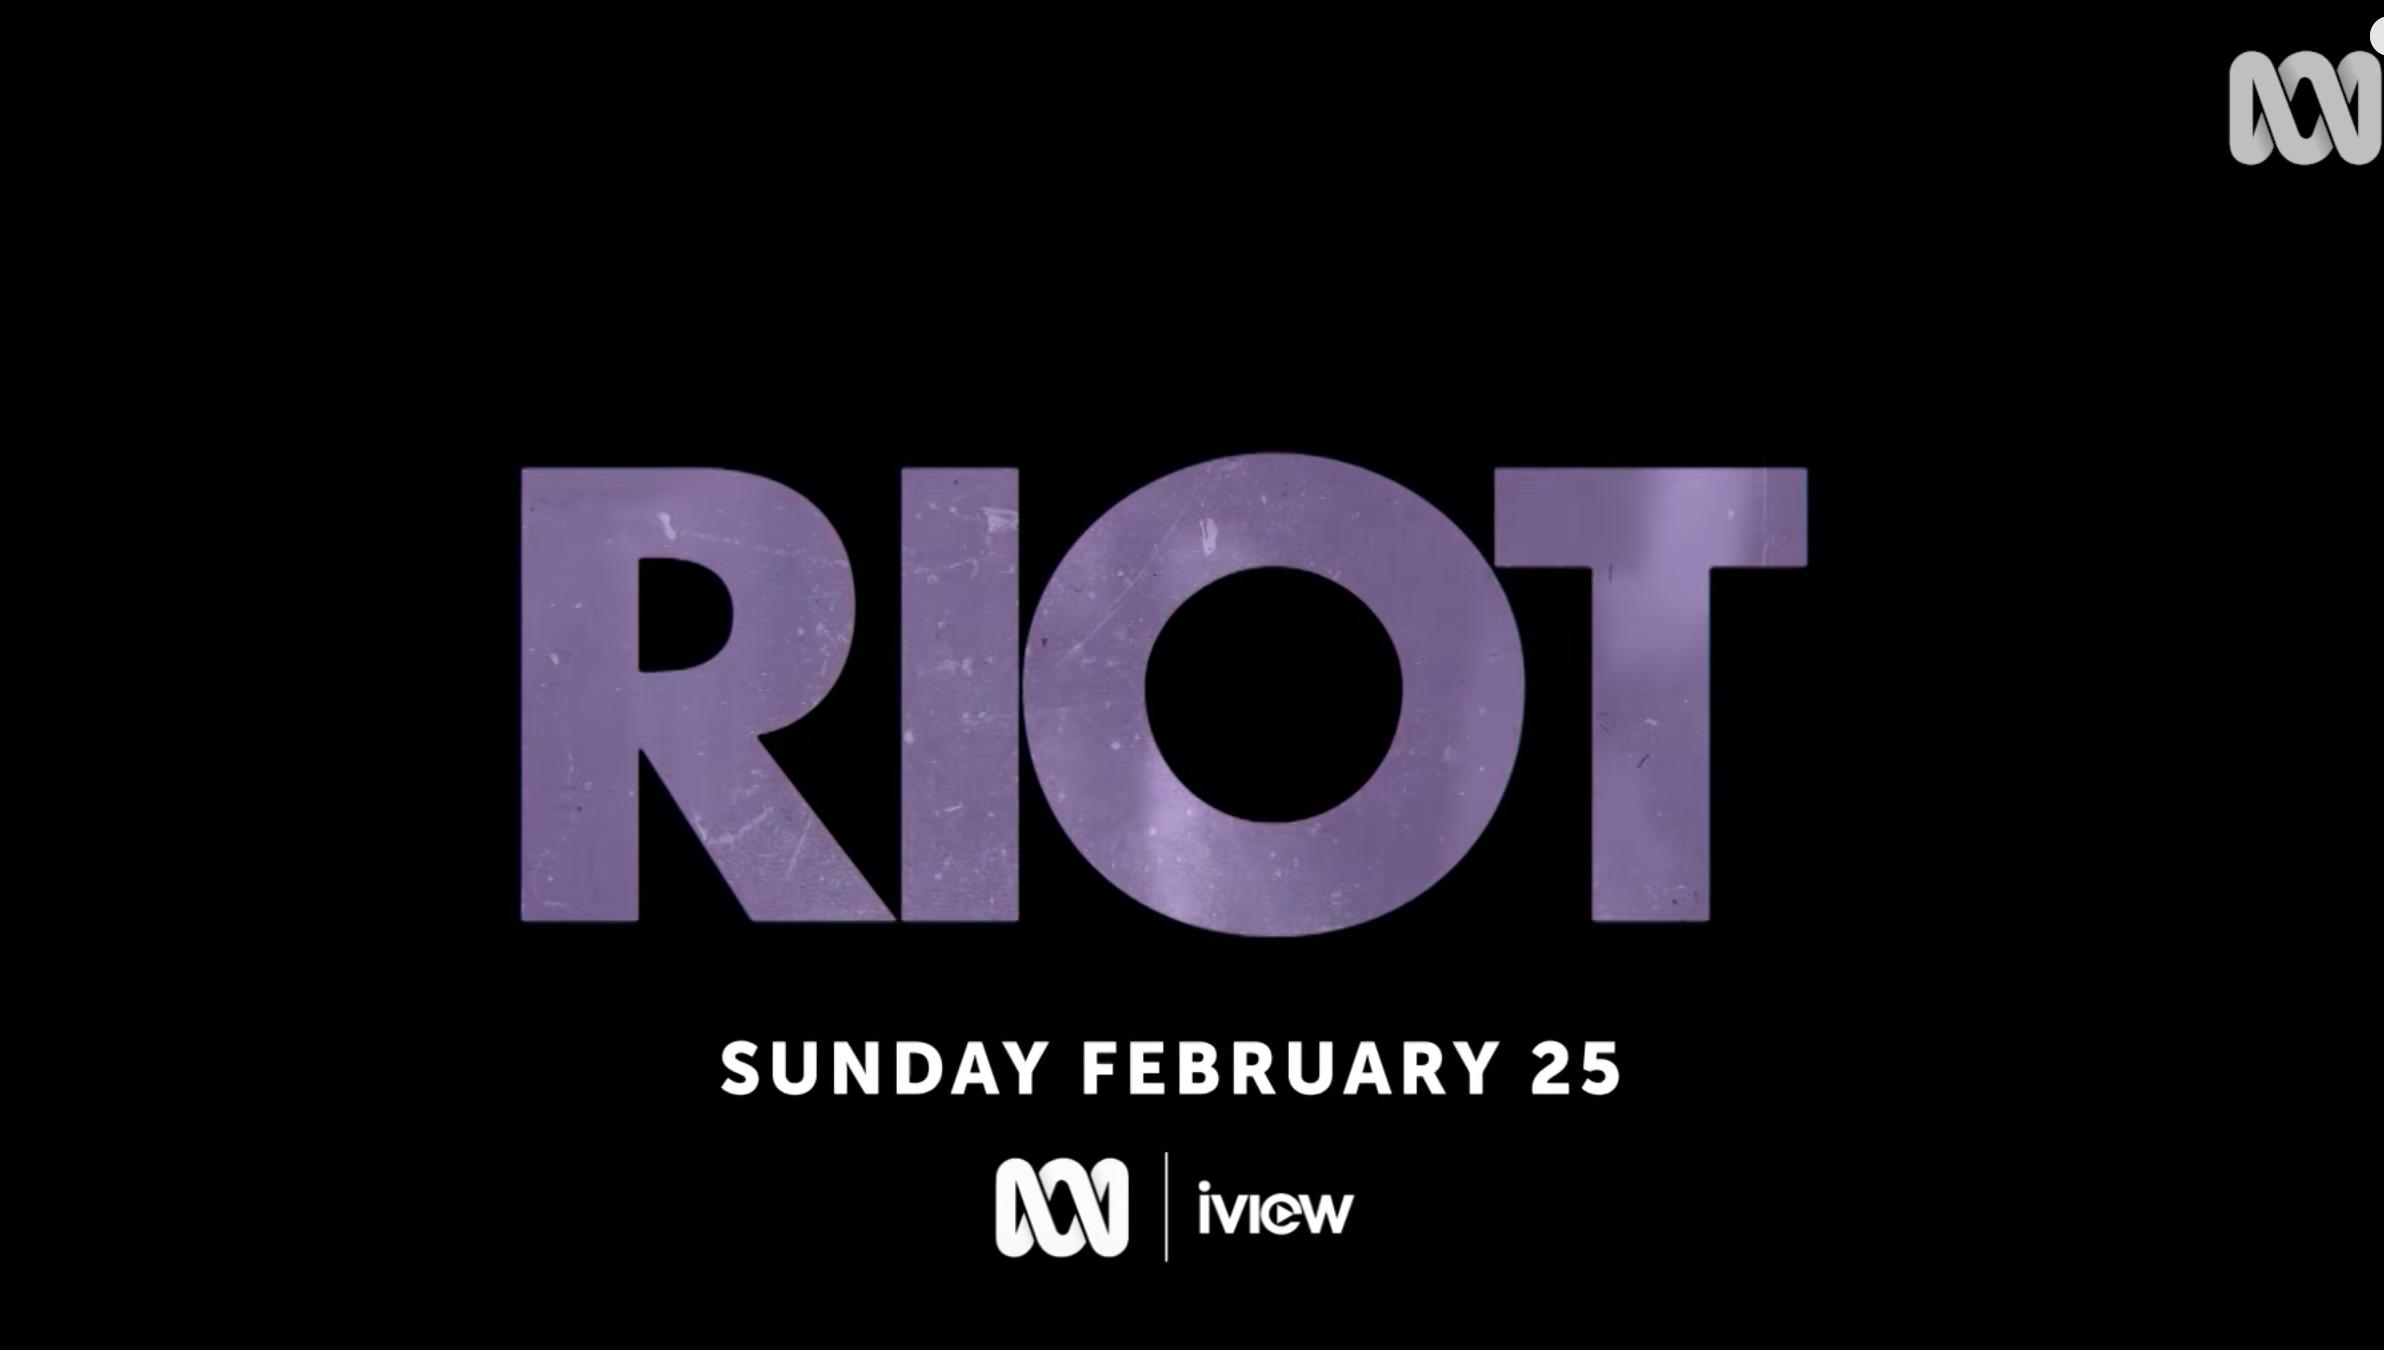 Watch ABC Movie RIOT and enjoy Sunday Night Roast